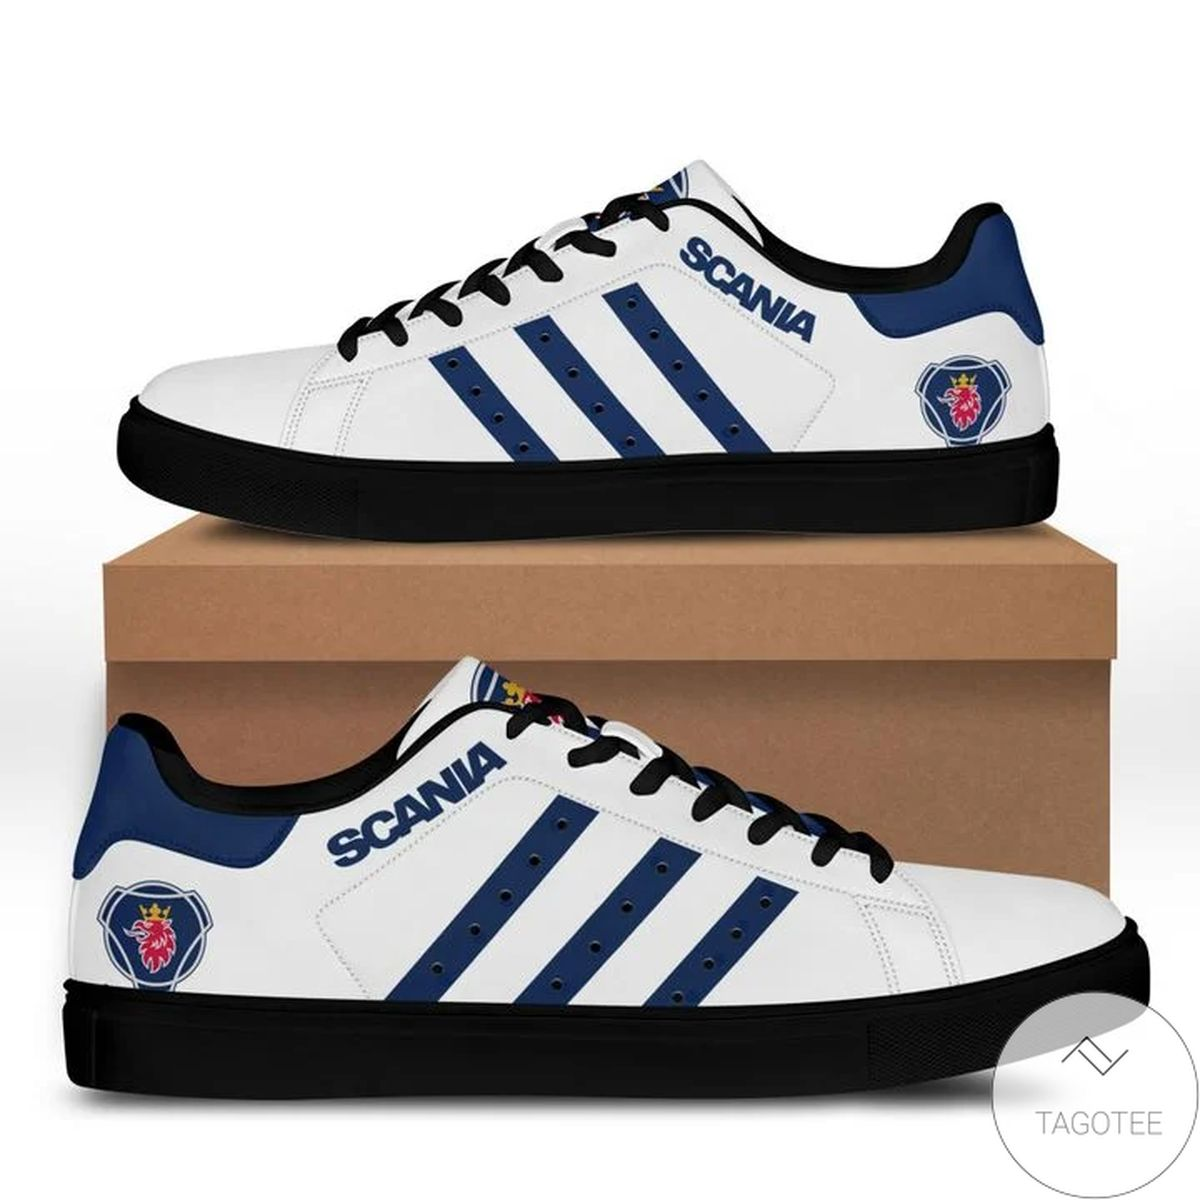 Free Ship Scania Stan Smith Shoes